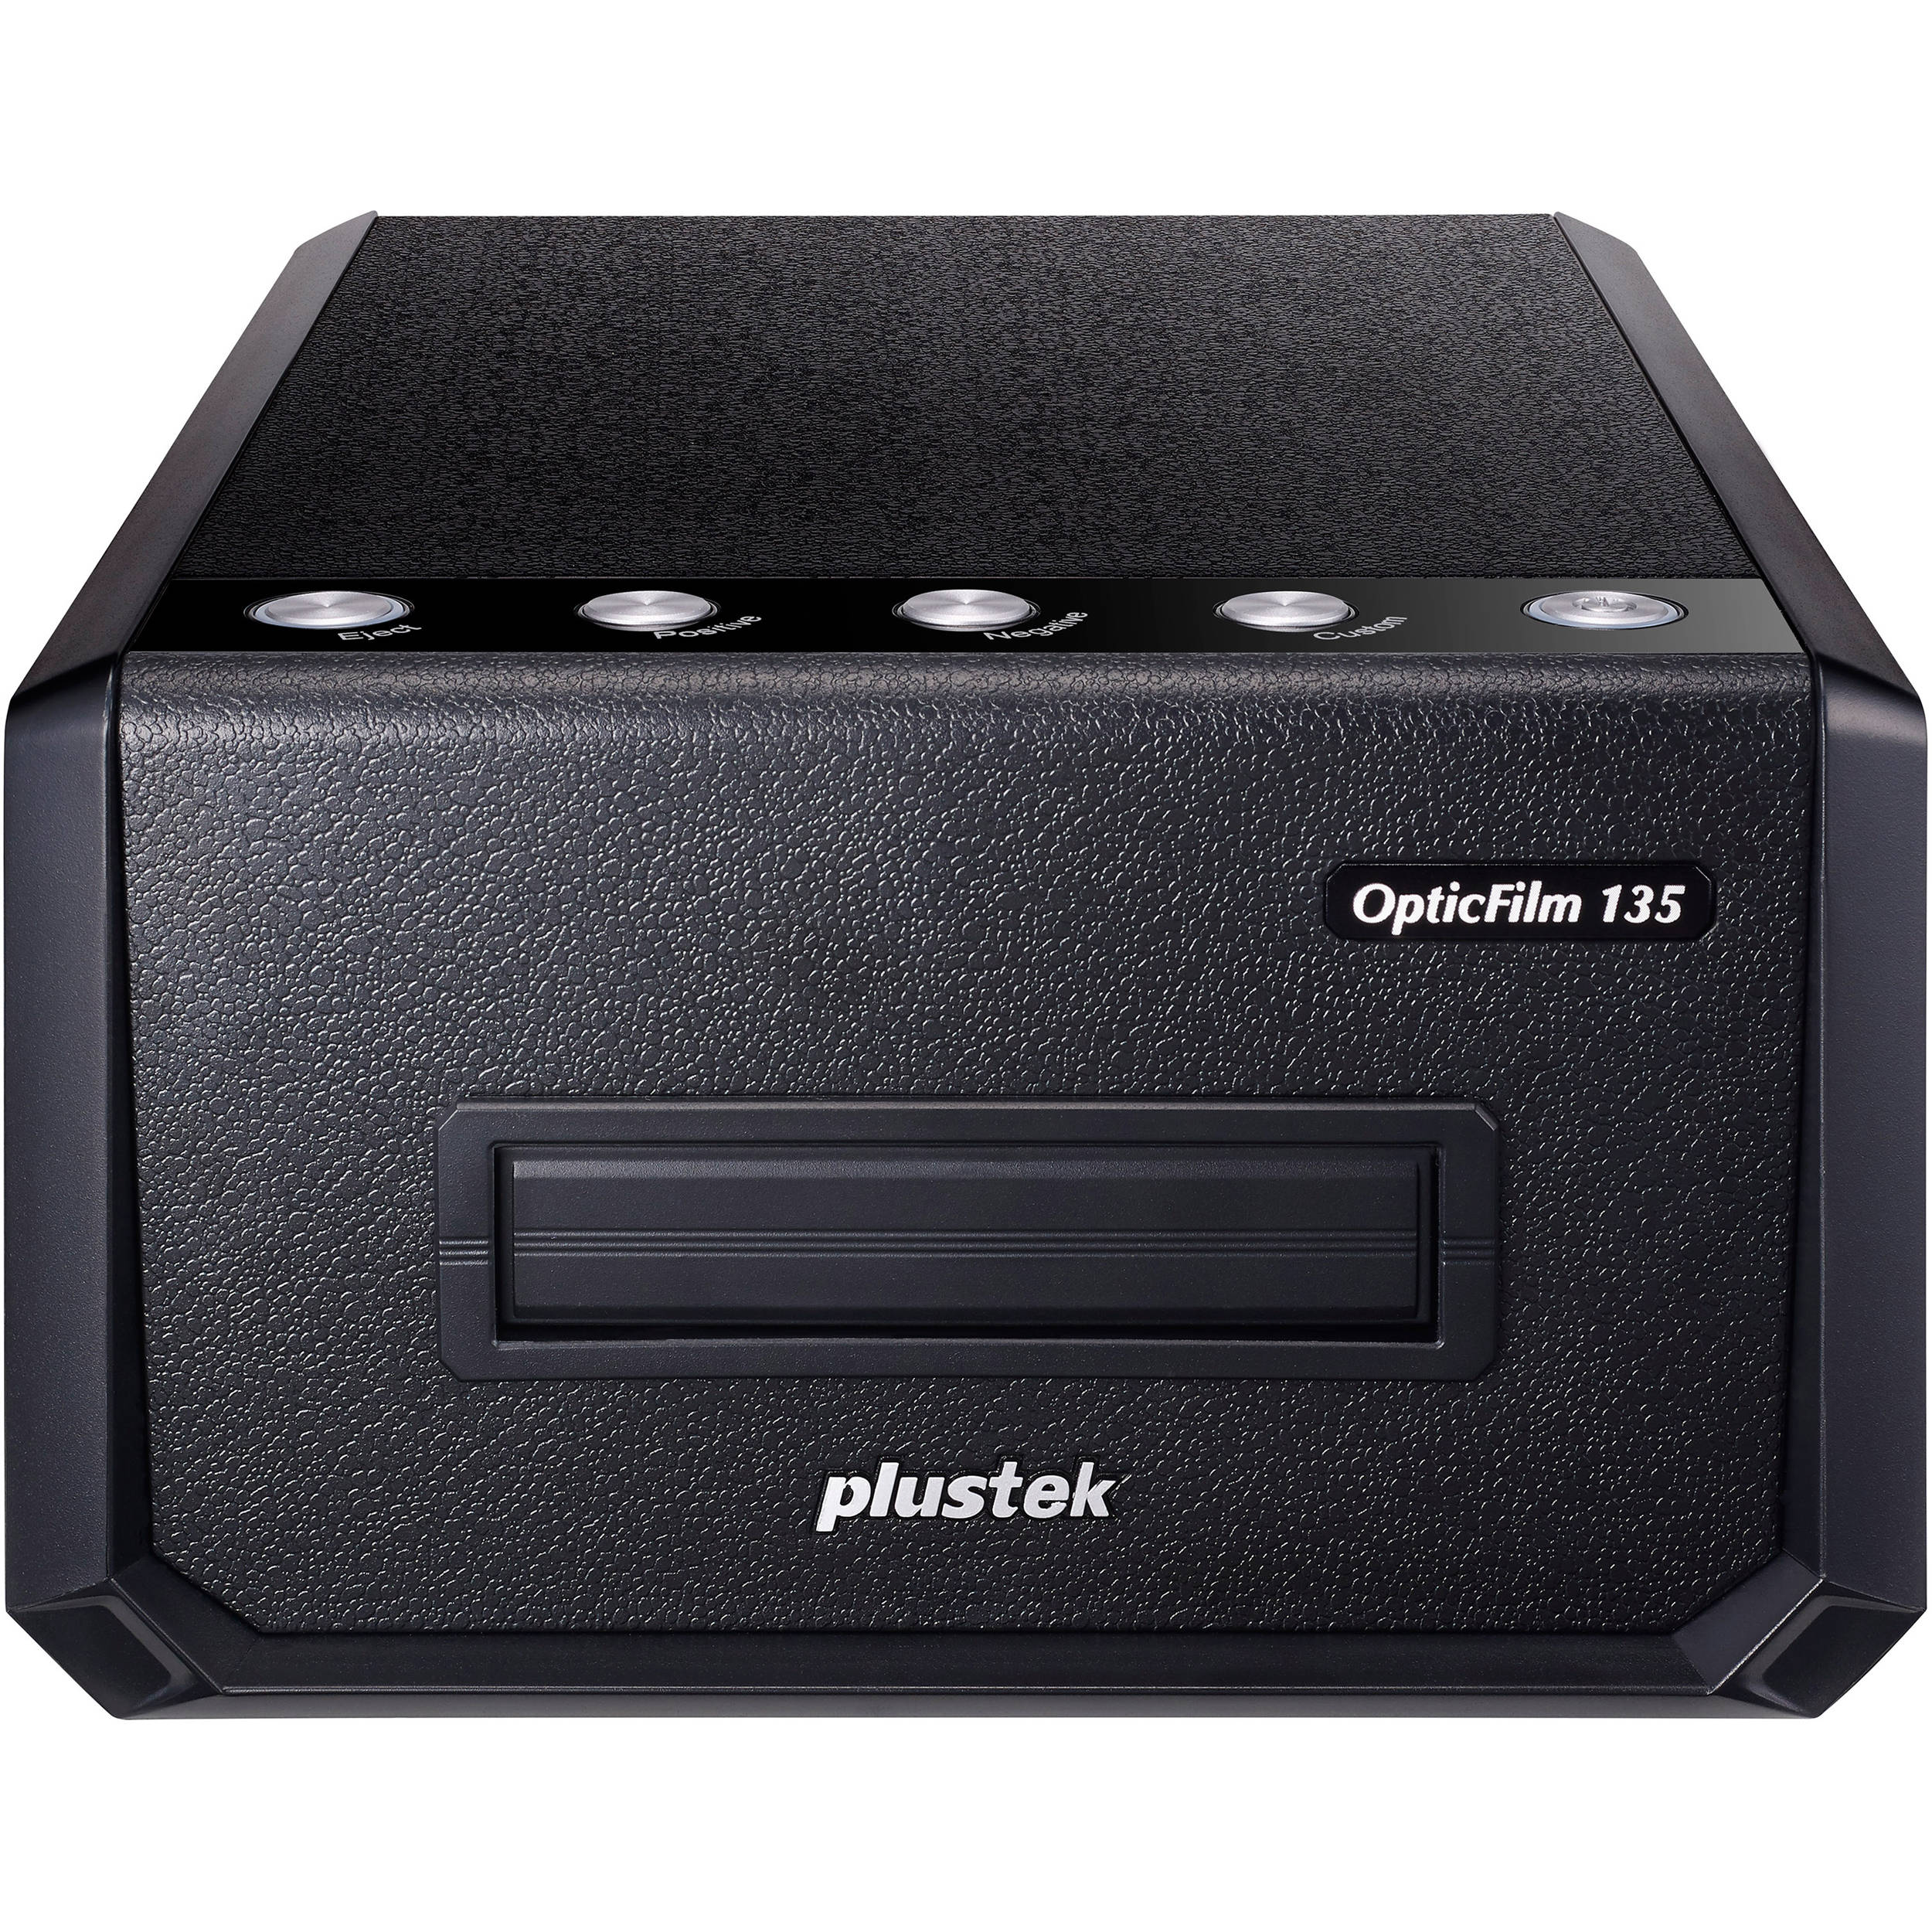 Plustek OpticFilm 135 Film Scanner